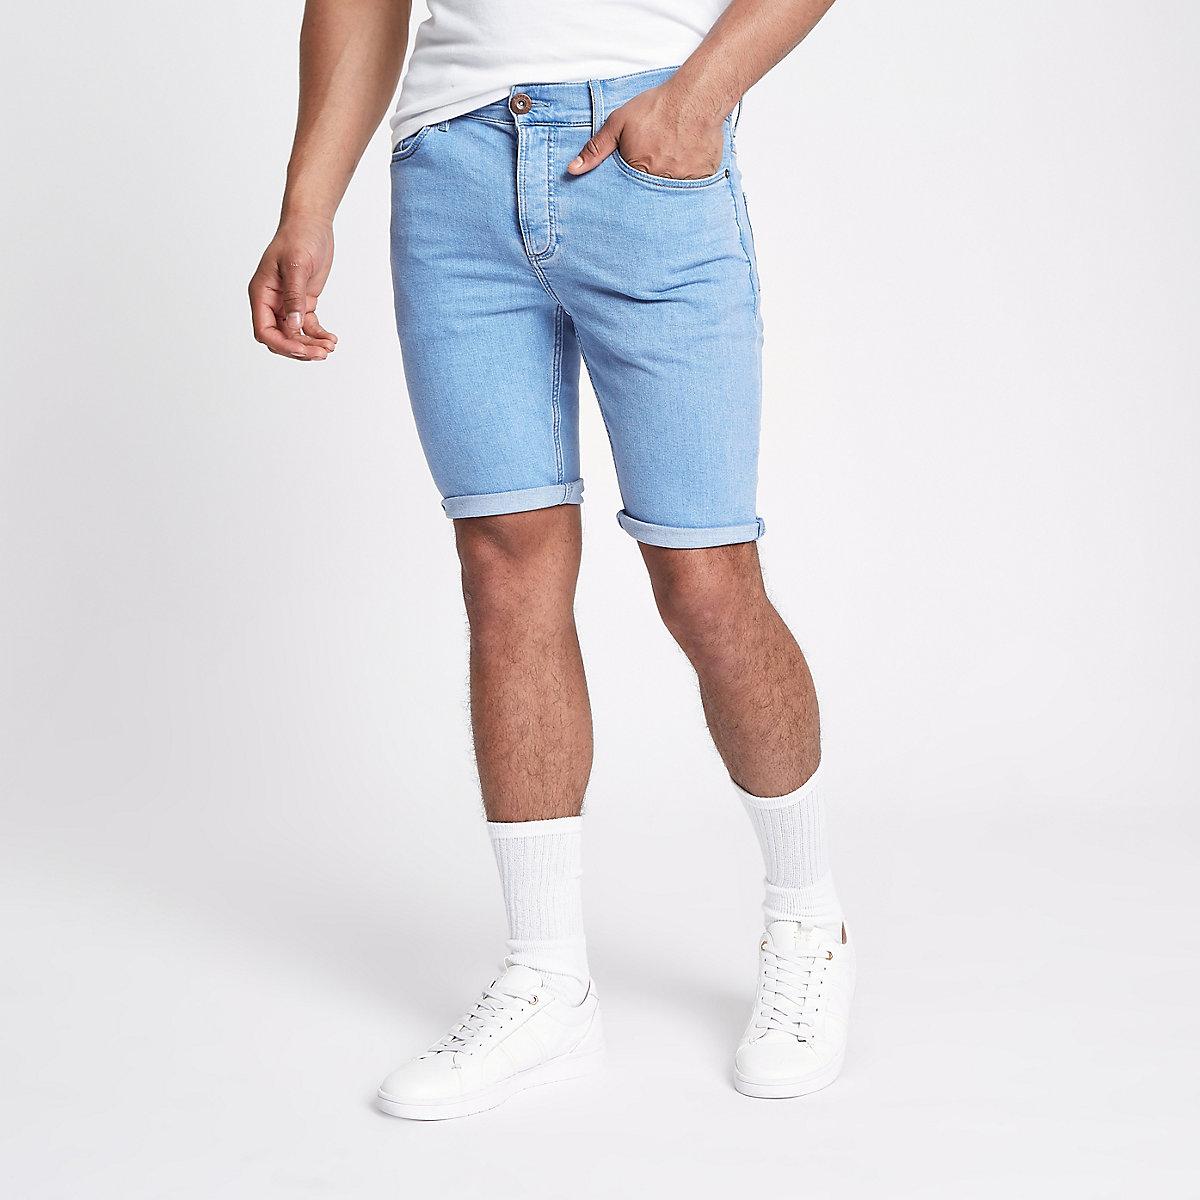 Light blue skinny 90s denim shorts